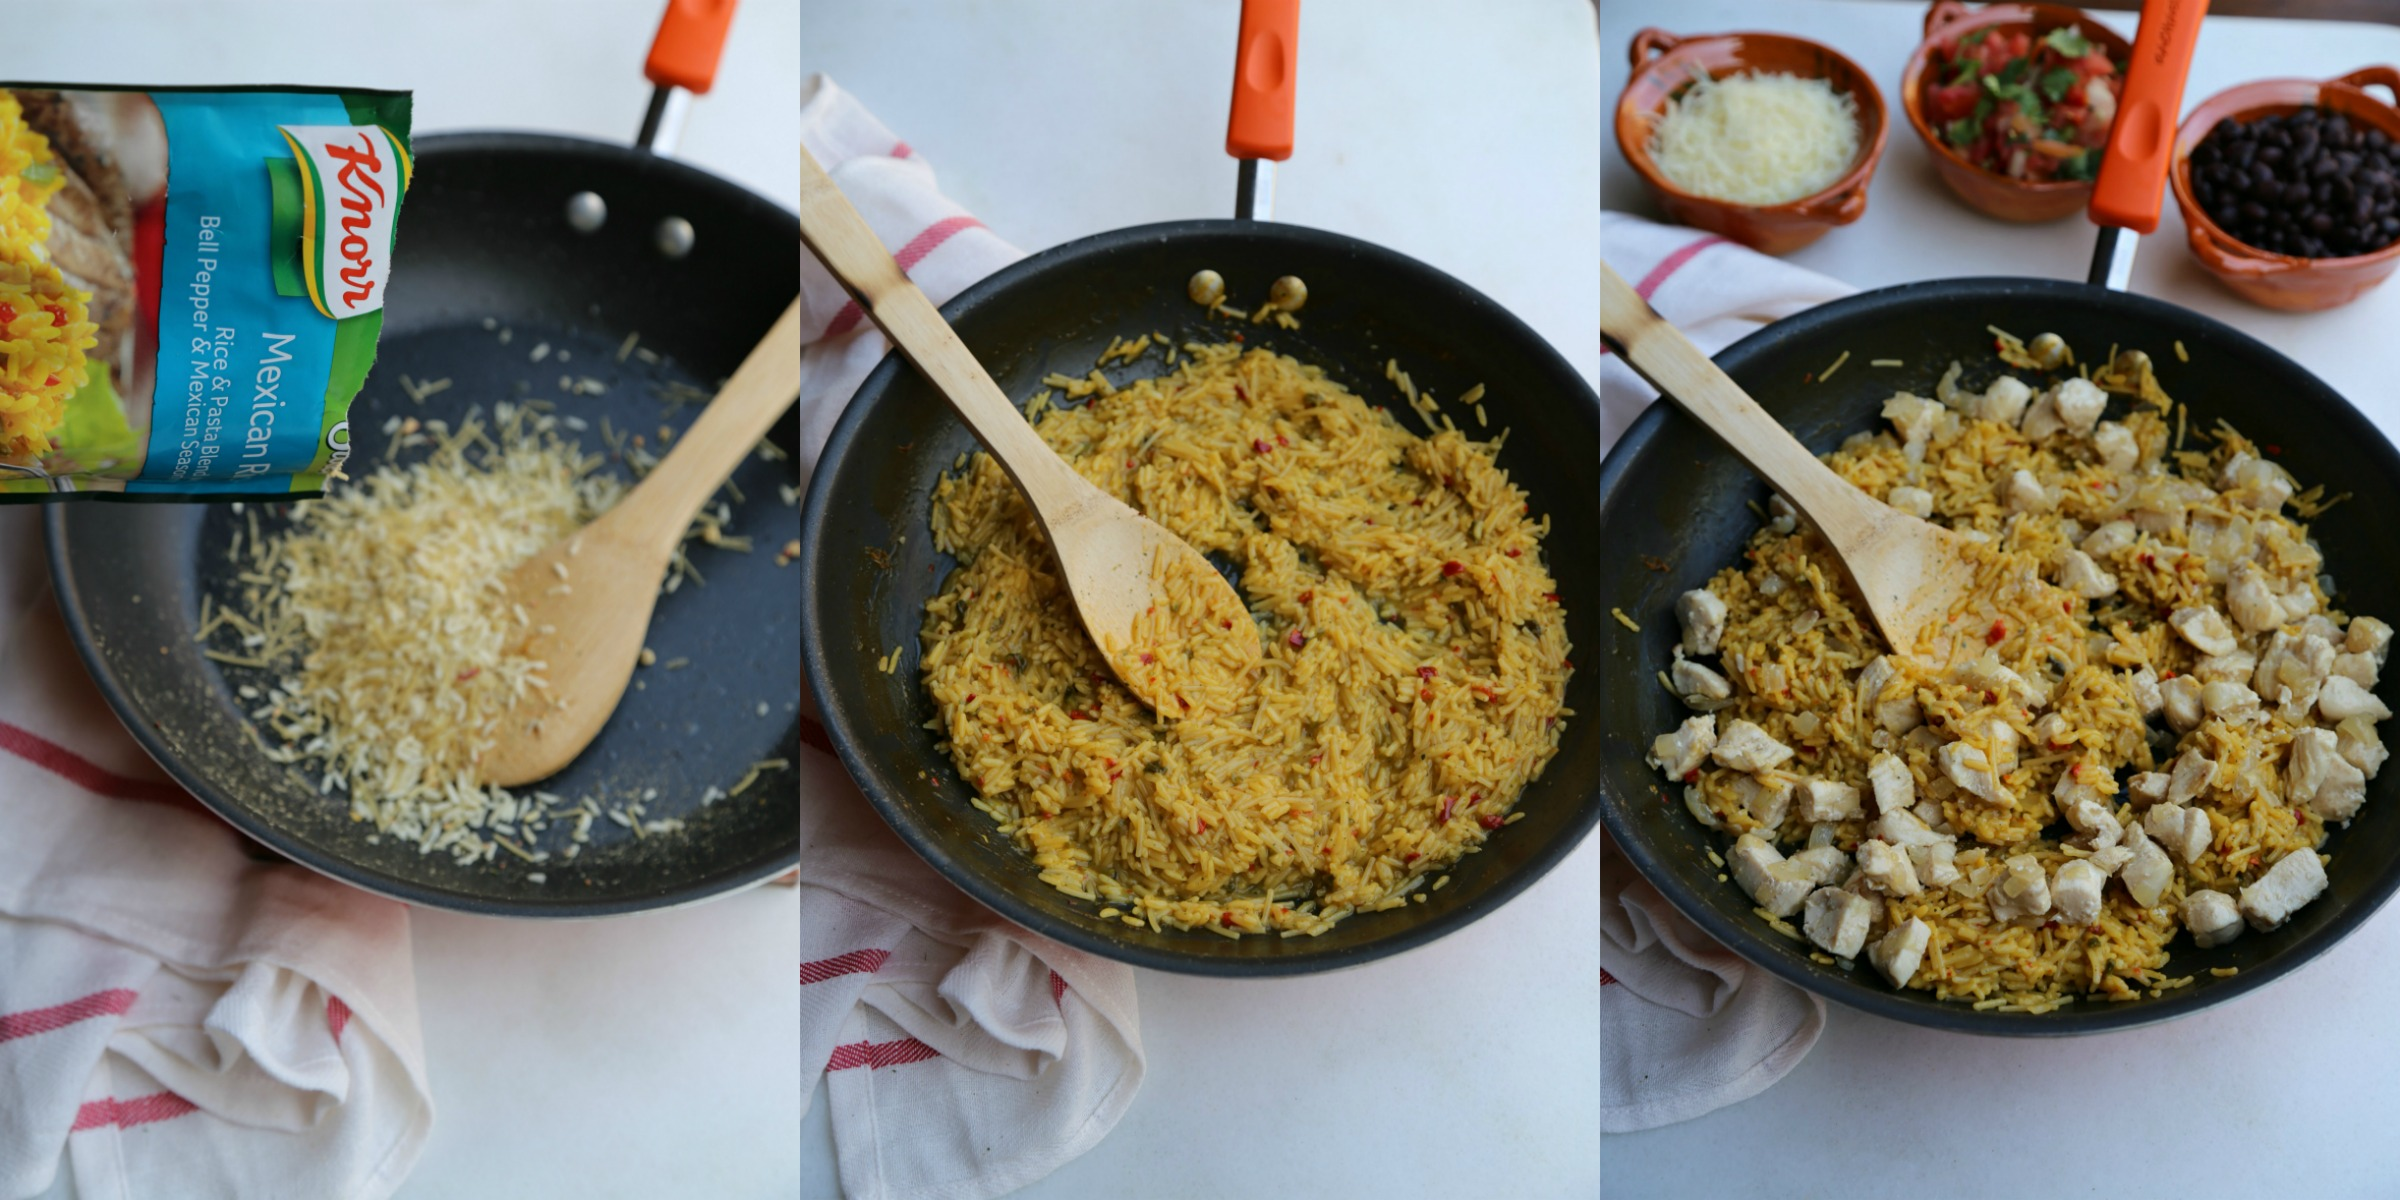 knorr-mexican-rice-stepbystep-burrito-bowls-vianneyrodriguez-sweetlifebake